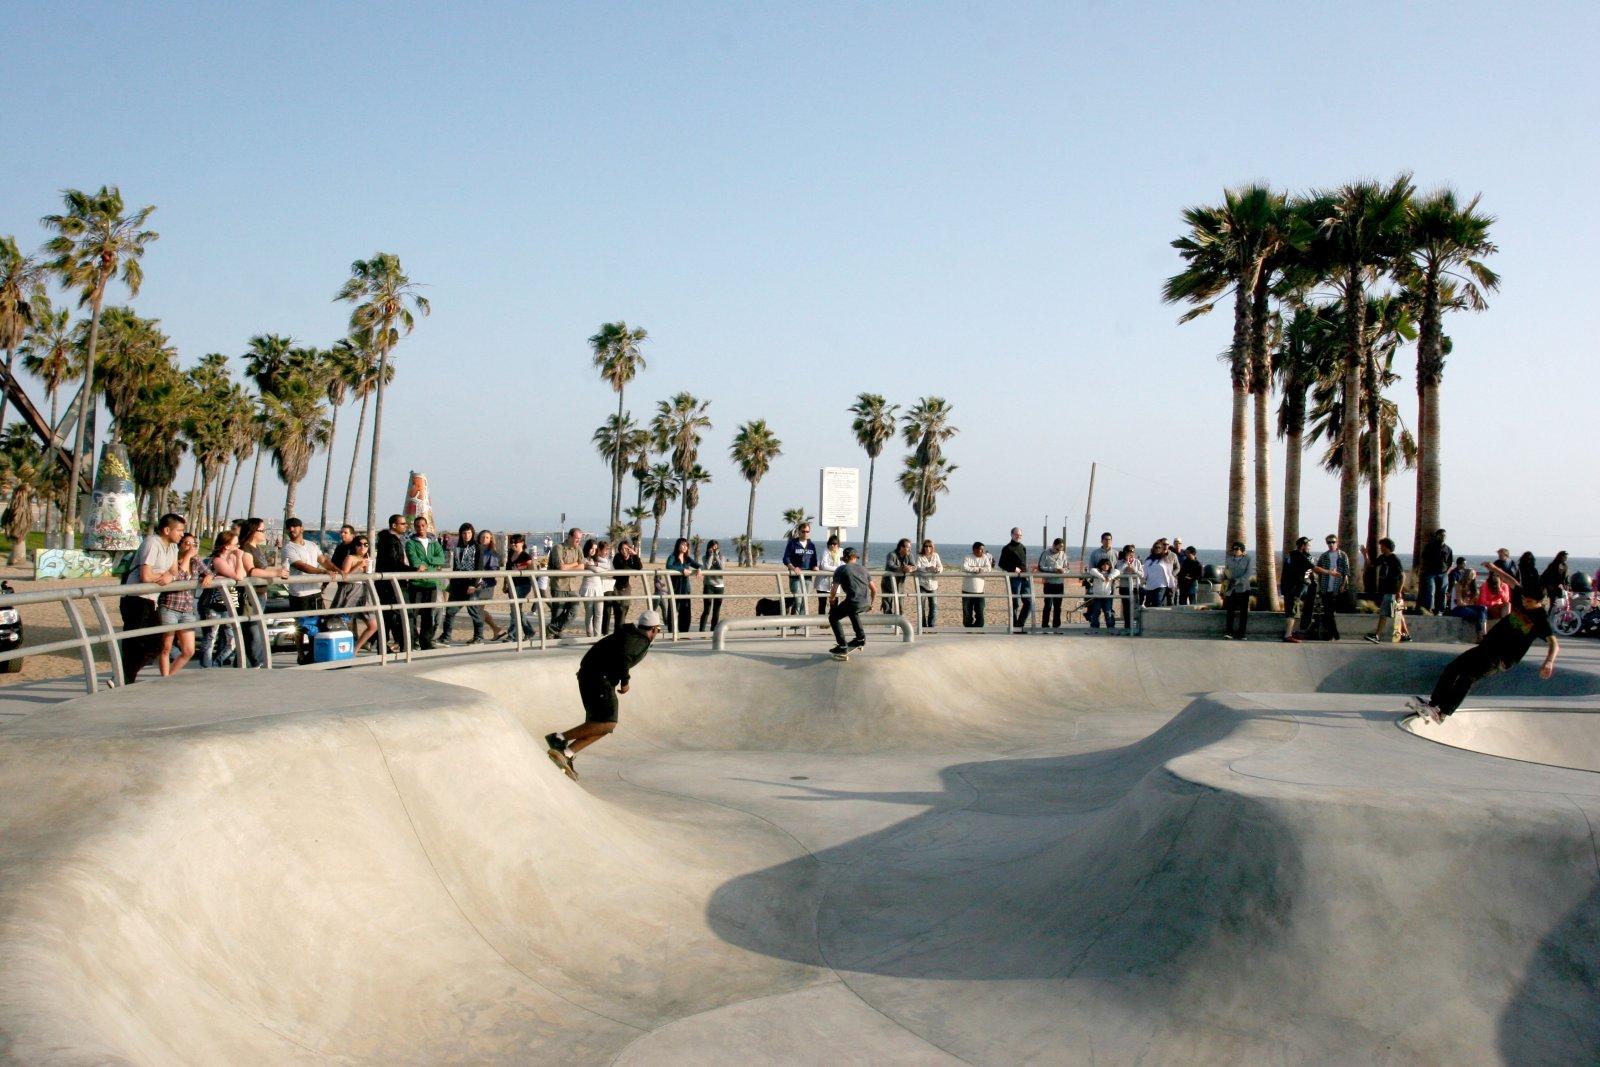 Click image for larger version  Name:IMG_0711 skateboard rink.jpg Views:56 Size:256.4 KB ID:100657